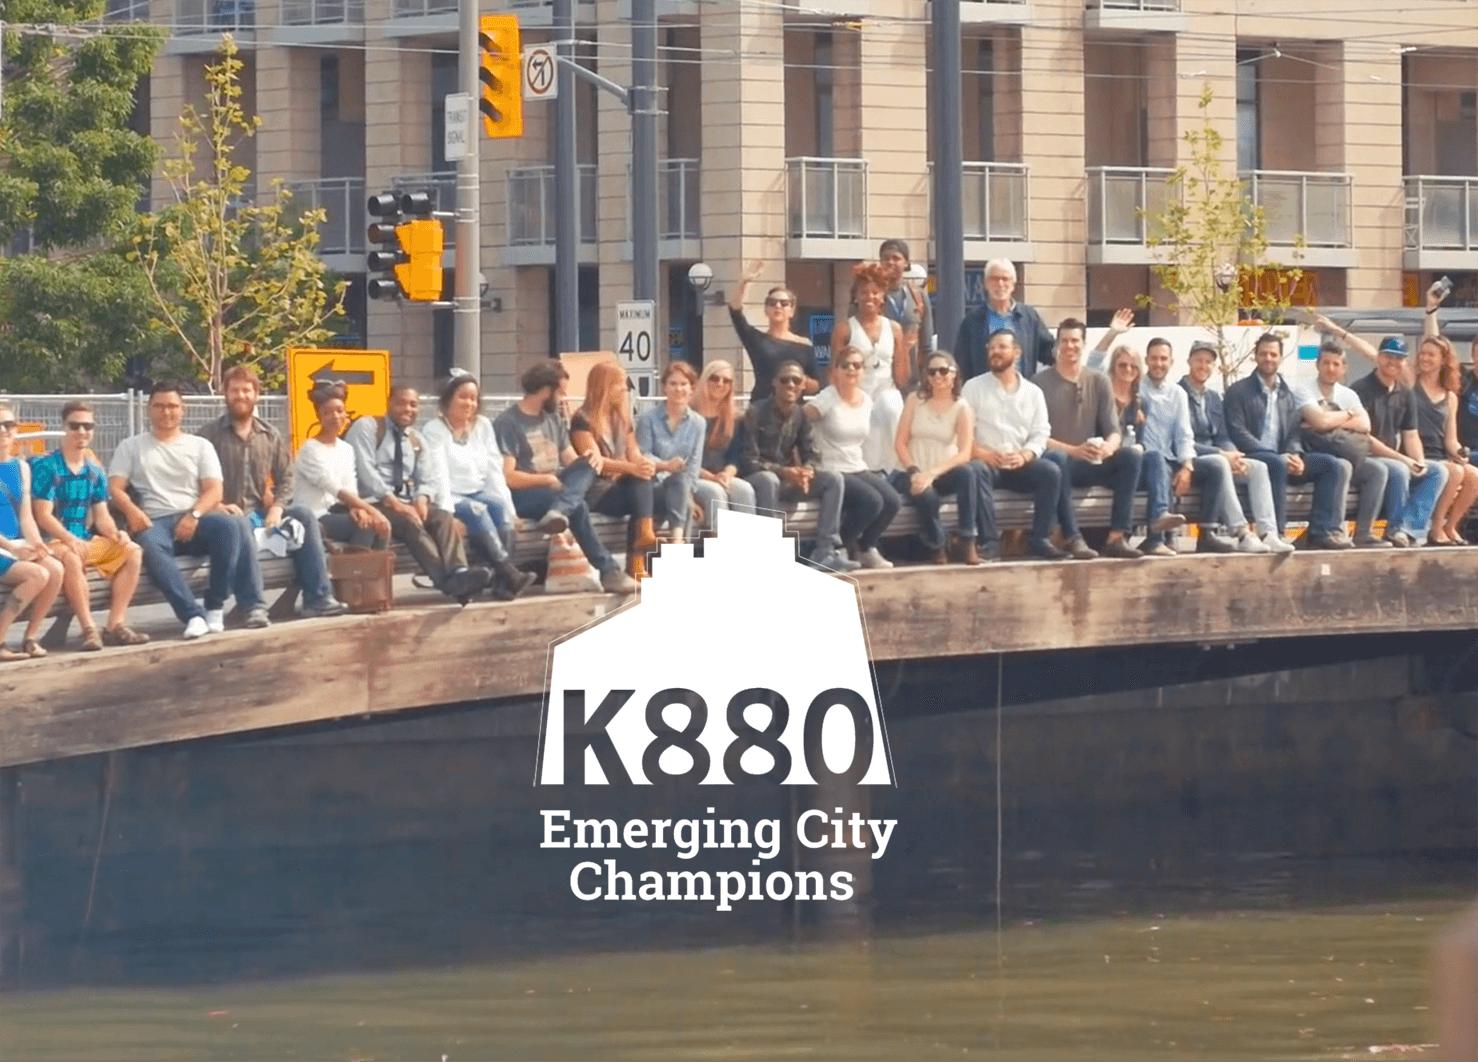 K880 Emerging City Champions